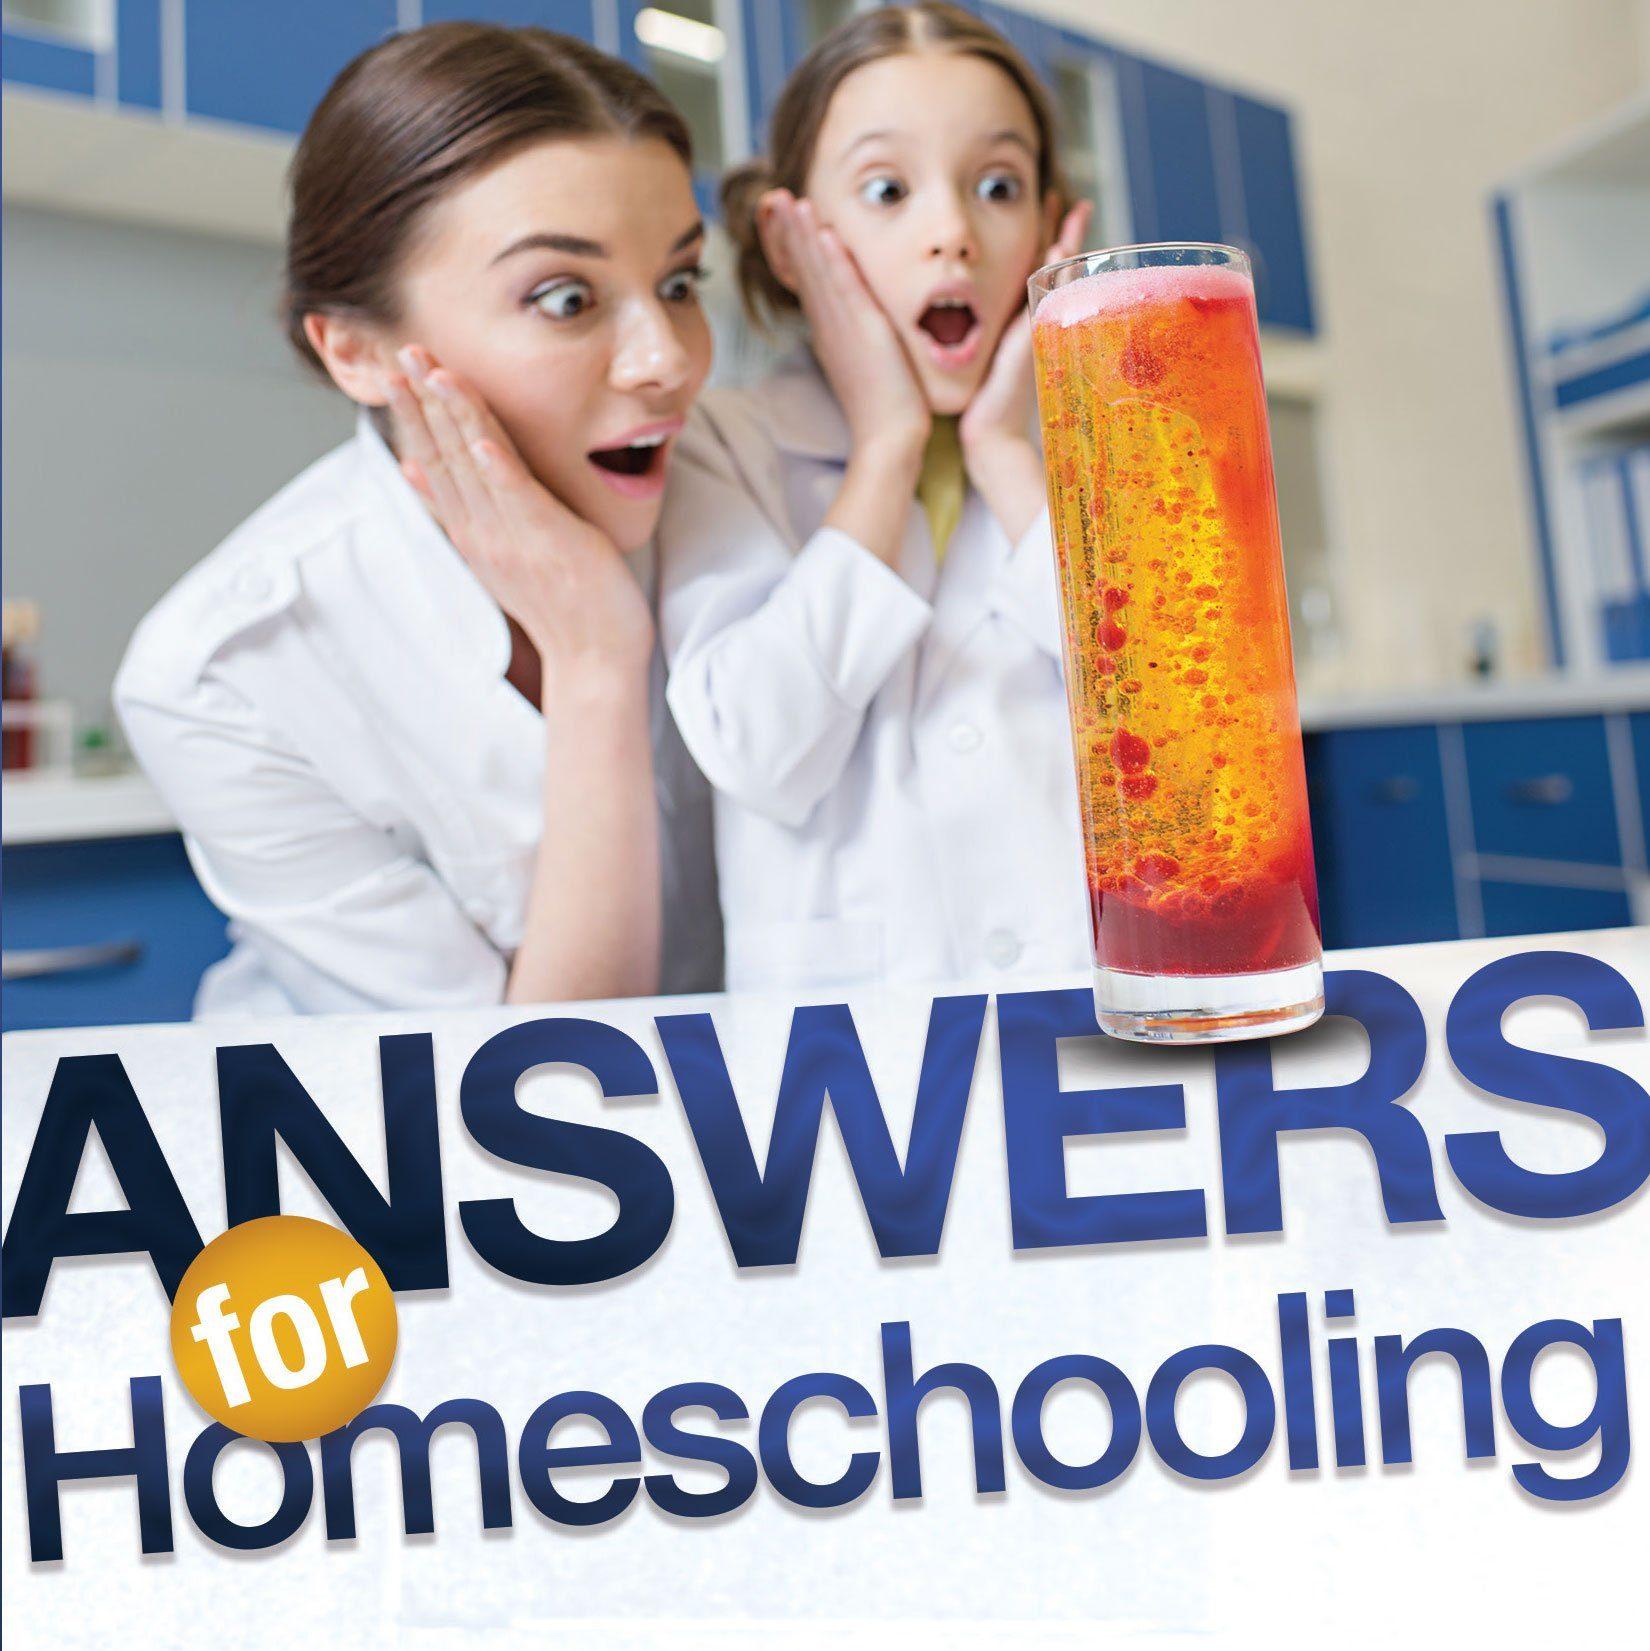 20 Reasons to Homeschool